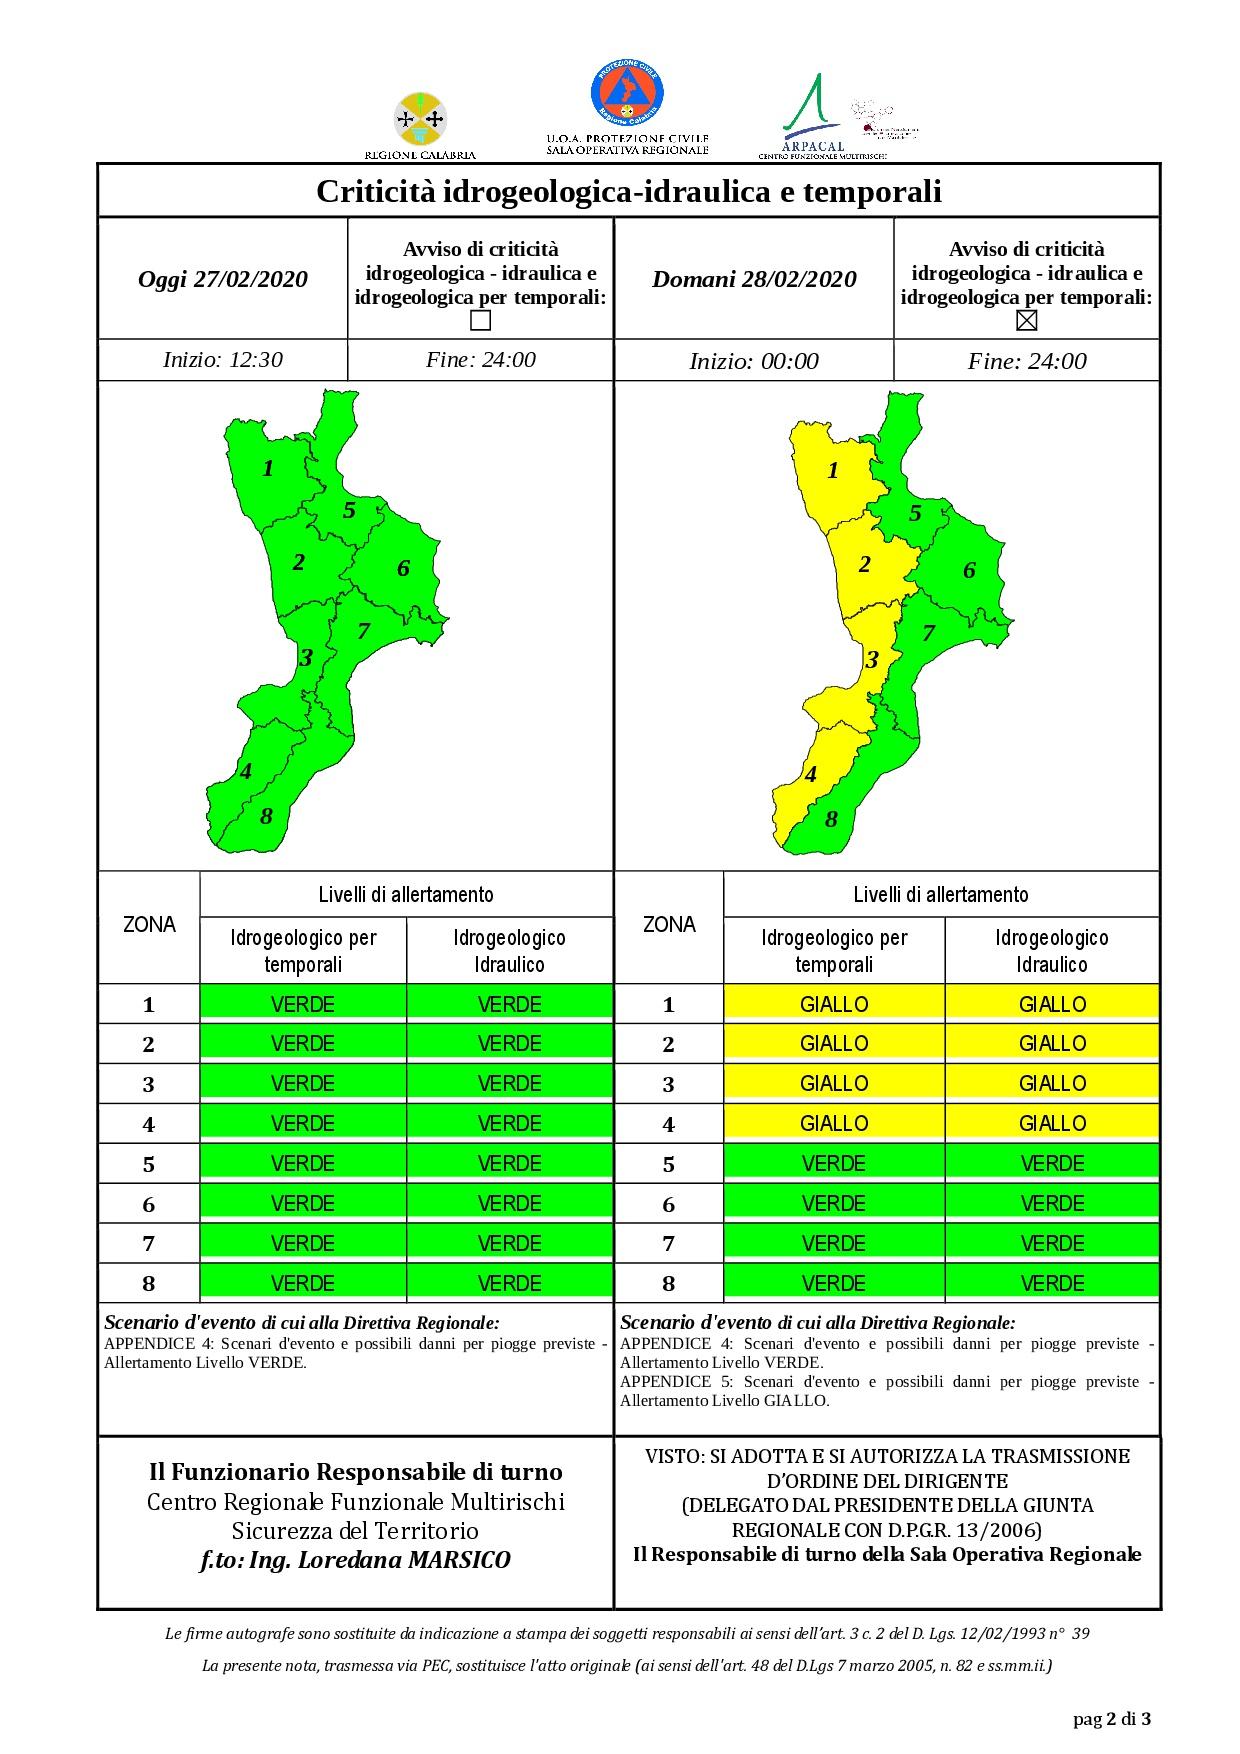 Criticità idrogeologica-idraulica e temporali in Calabria 27-02-2020